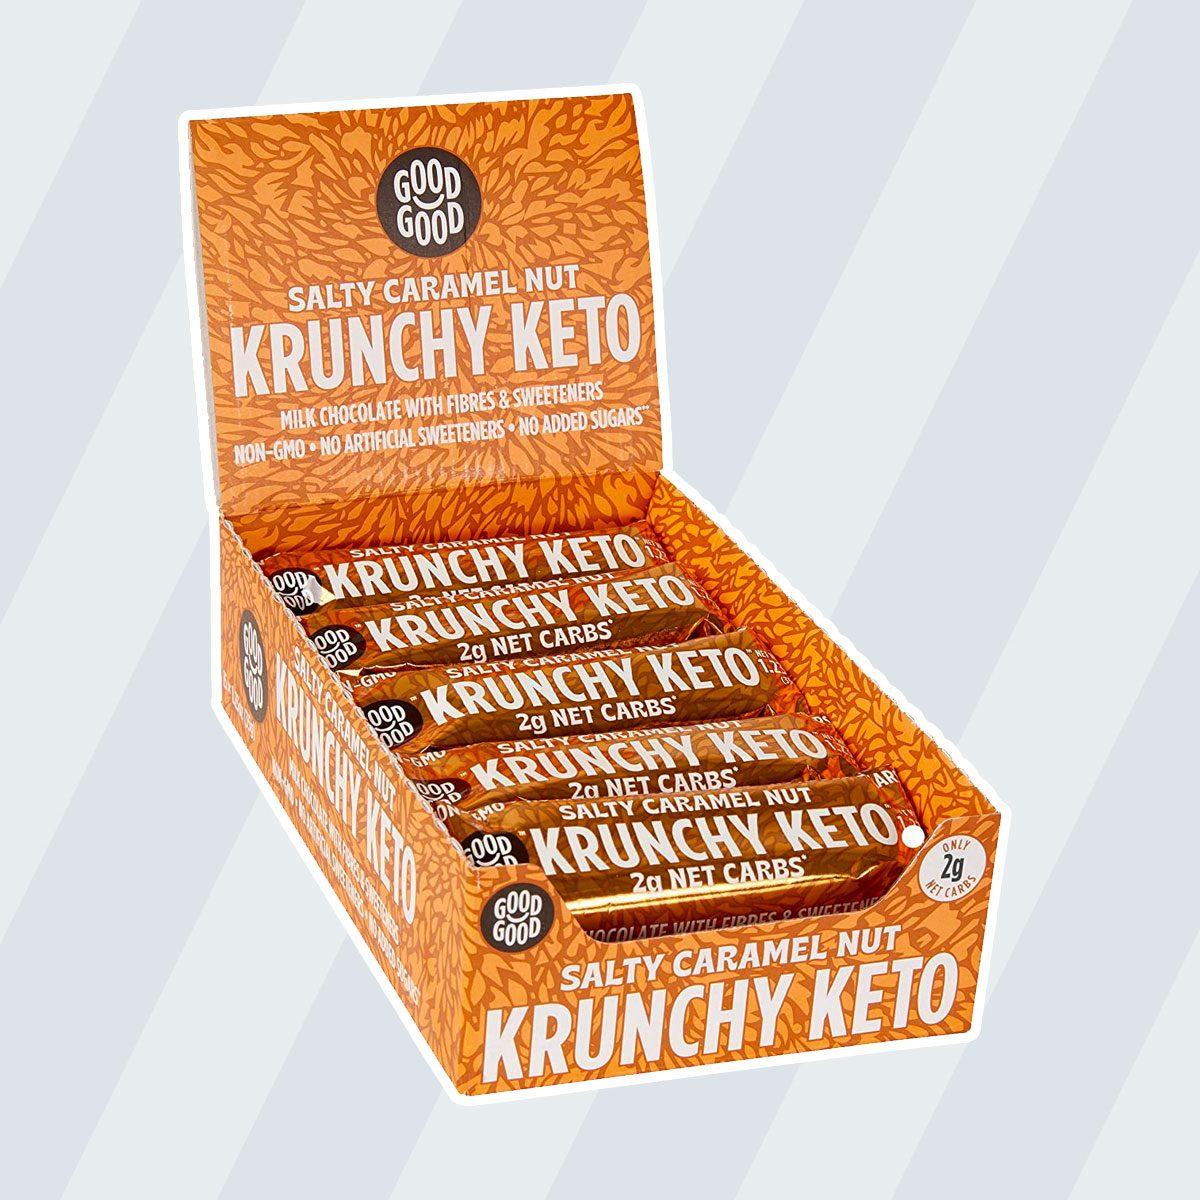 Krunchy Keto Bar keto snack bars